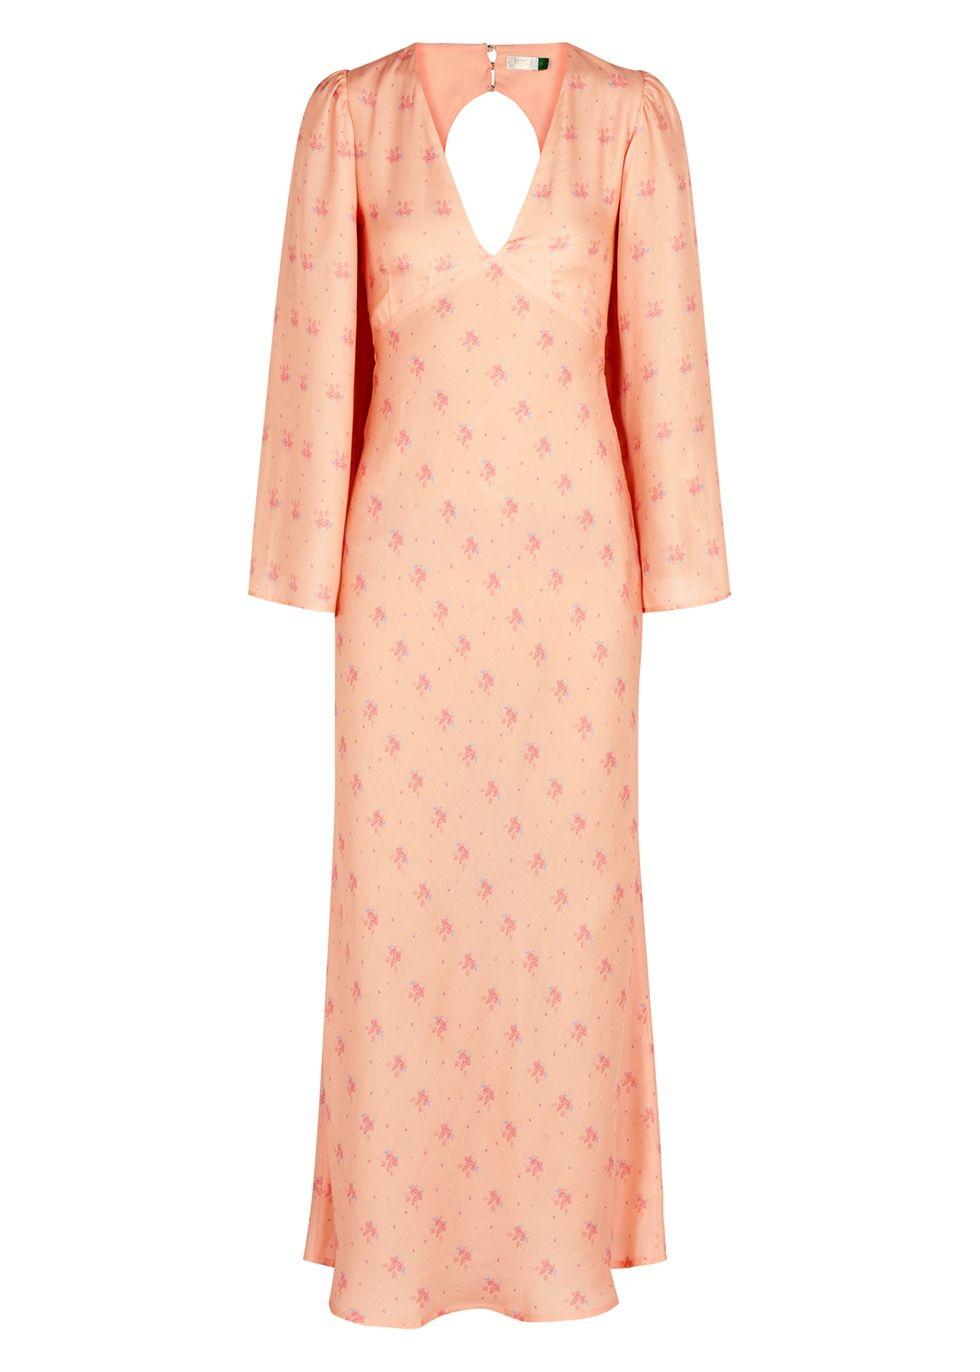 Pin By Onyinye Njoku Bafor On Things To Wear Dresses Fashion Silk Midi Dress [ 1372 x 980 Pixel ]